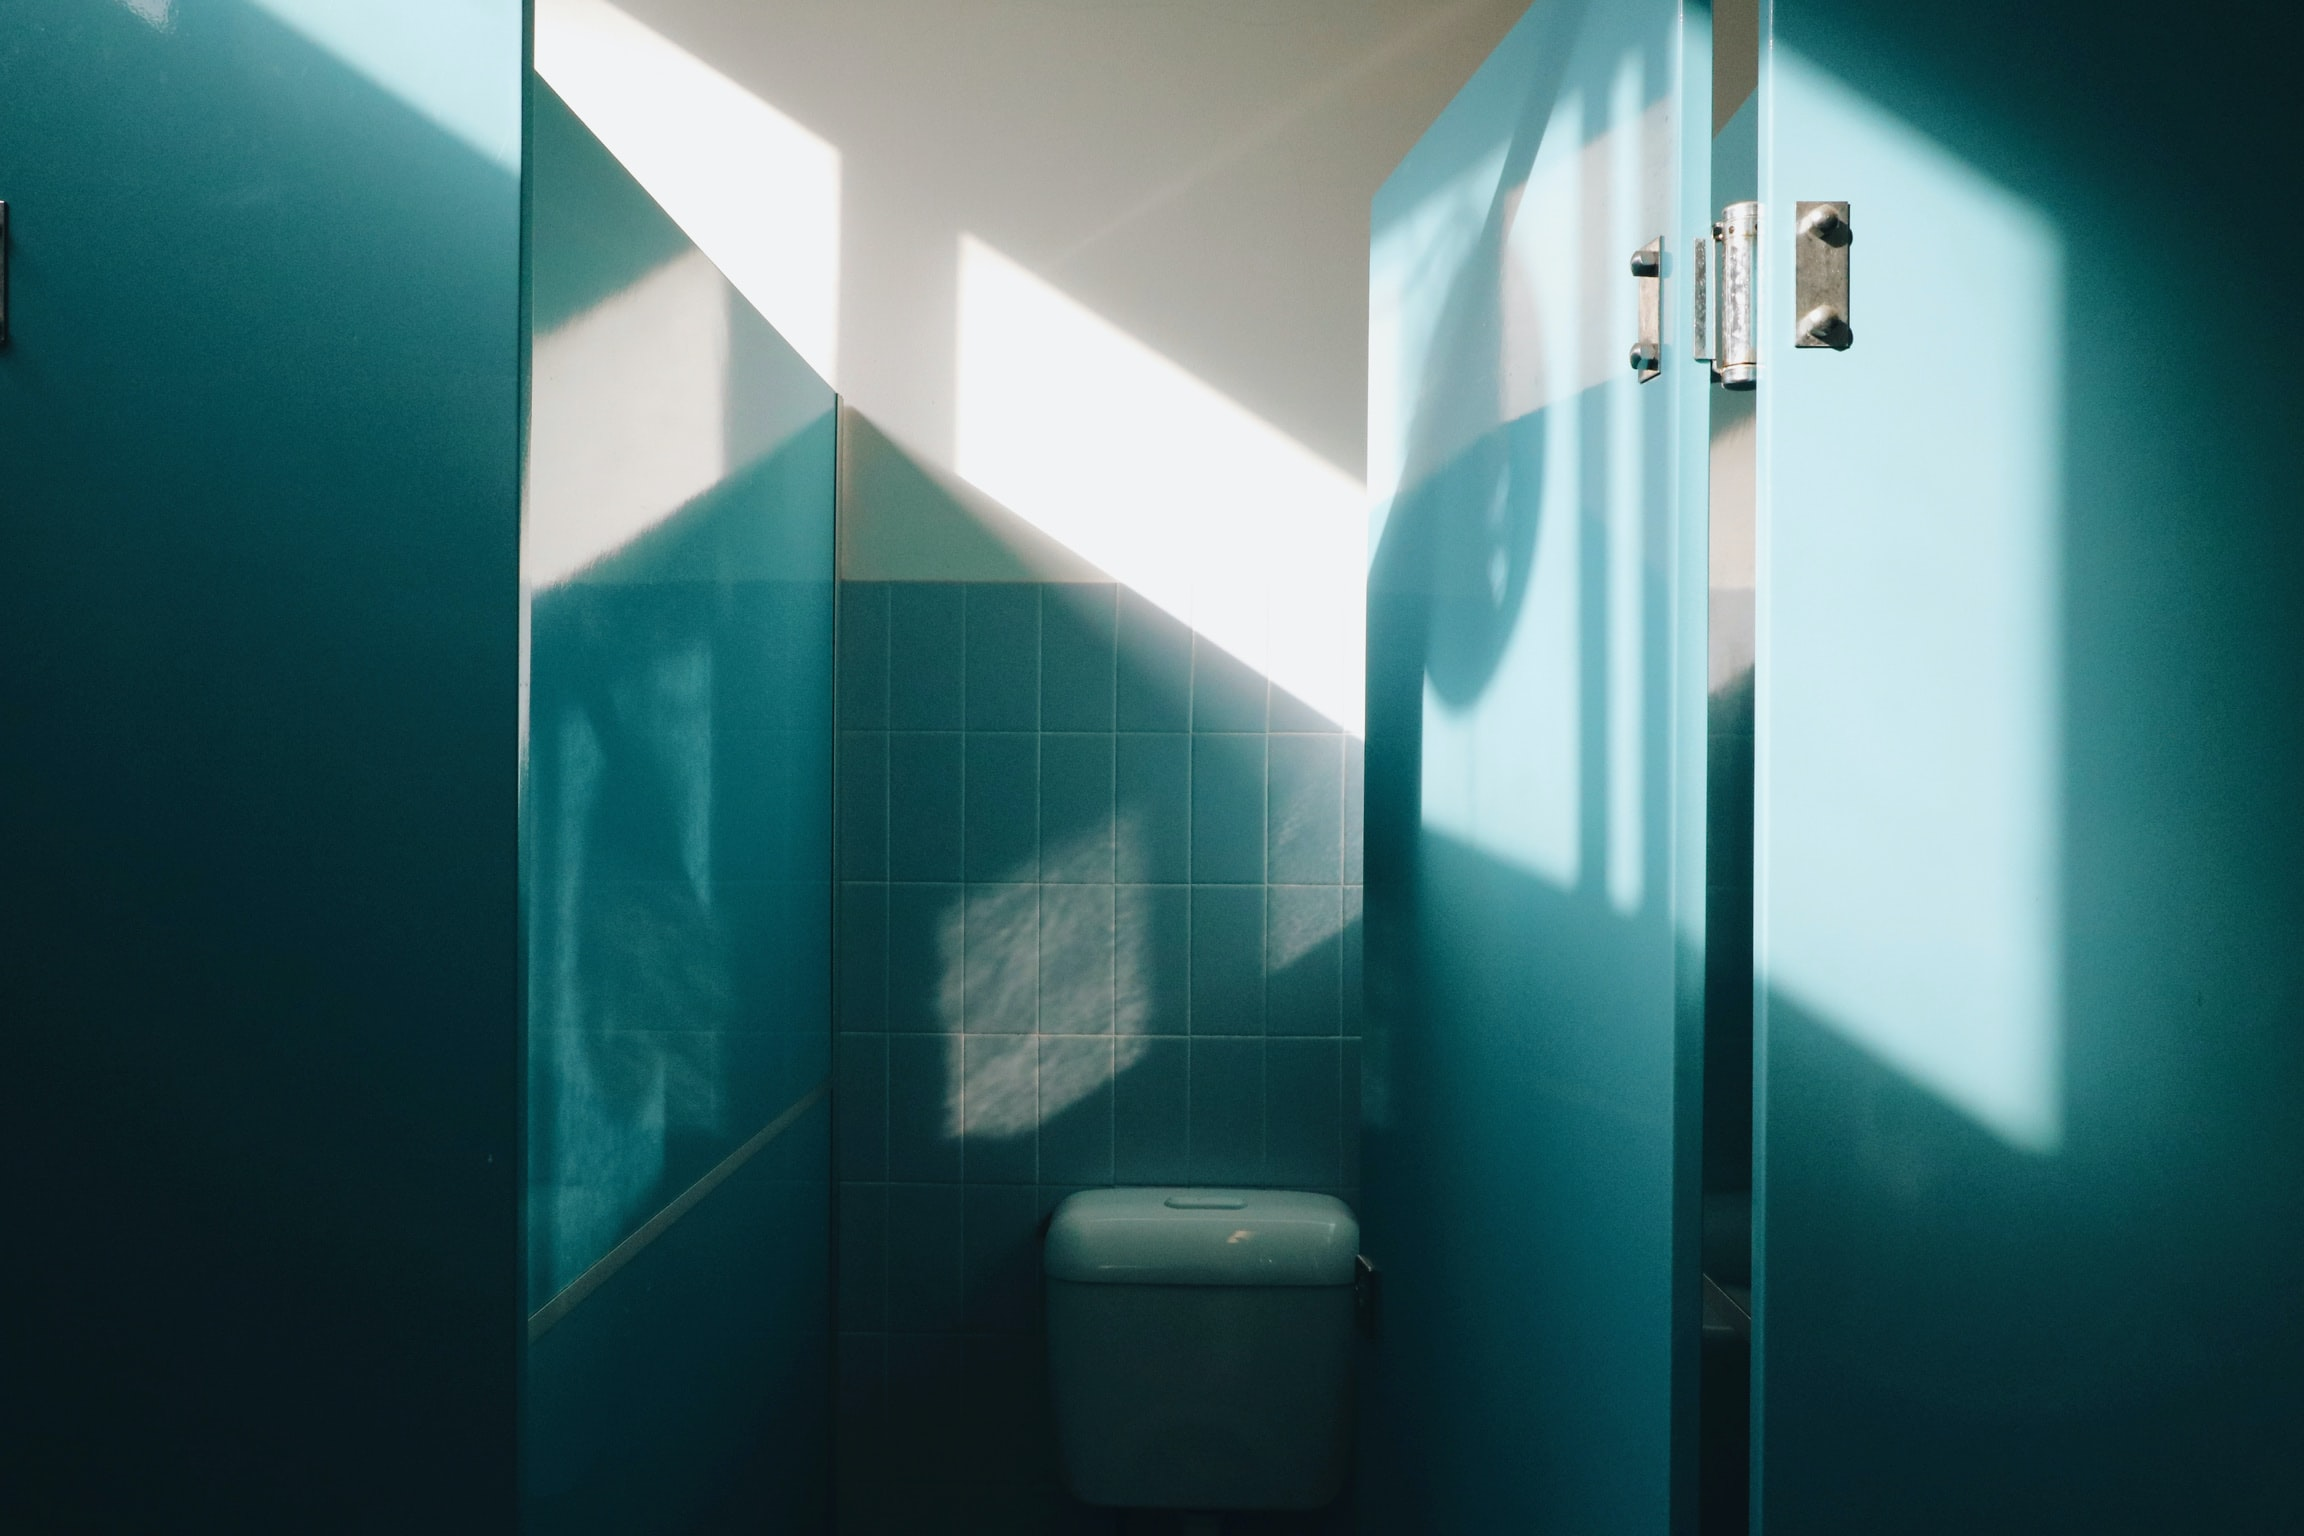 vacant white toilet sink